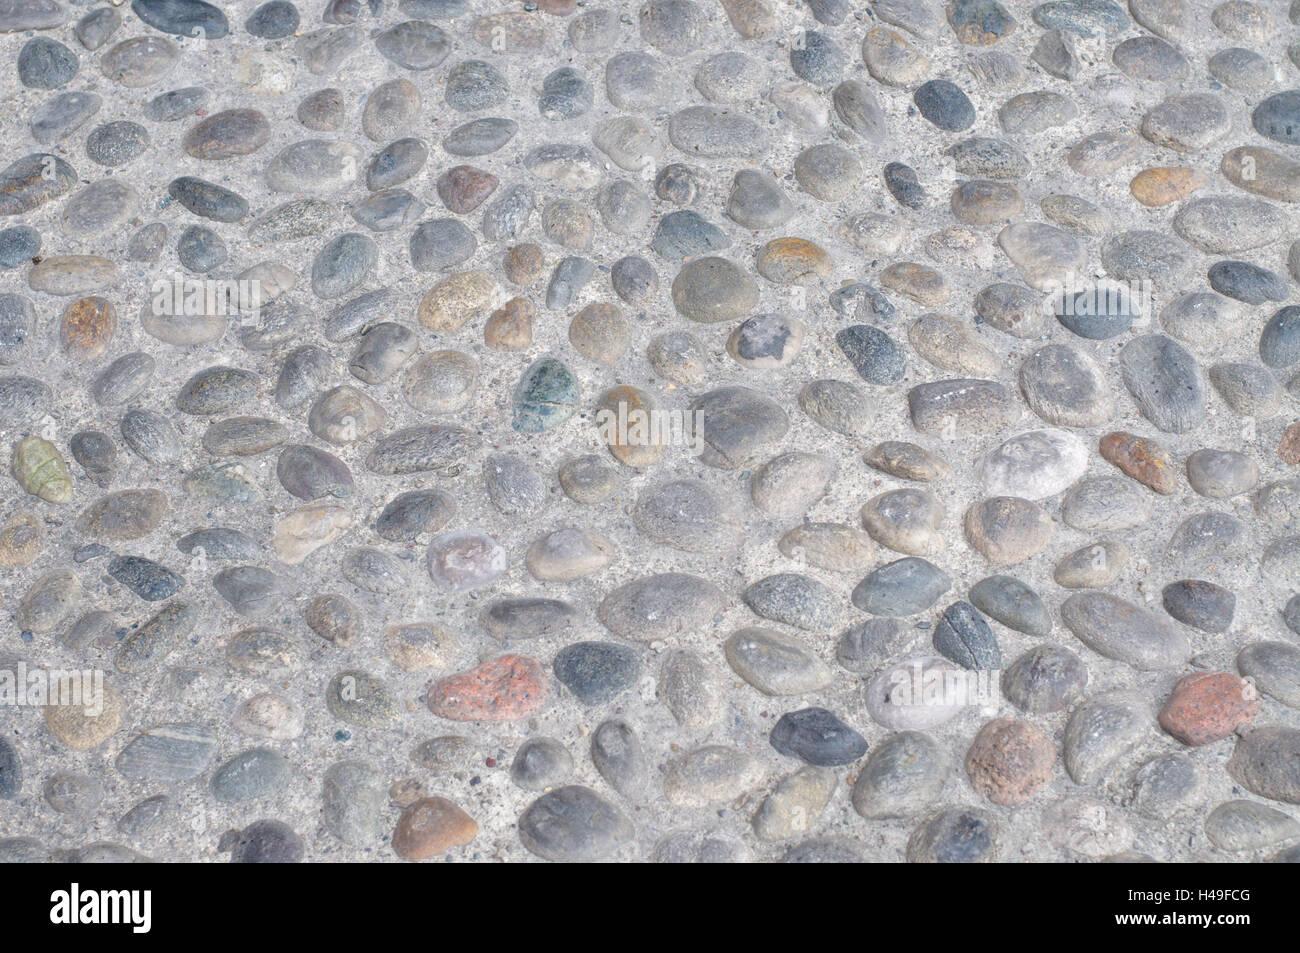 boden steinen beton guss formen stockfoto bild. Black Bedroom Furniture Sets. Home Design Ideas